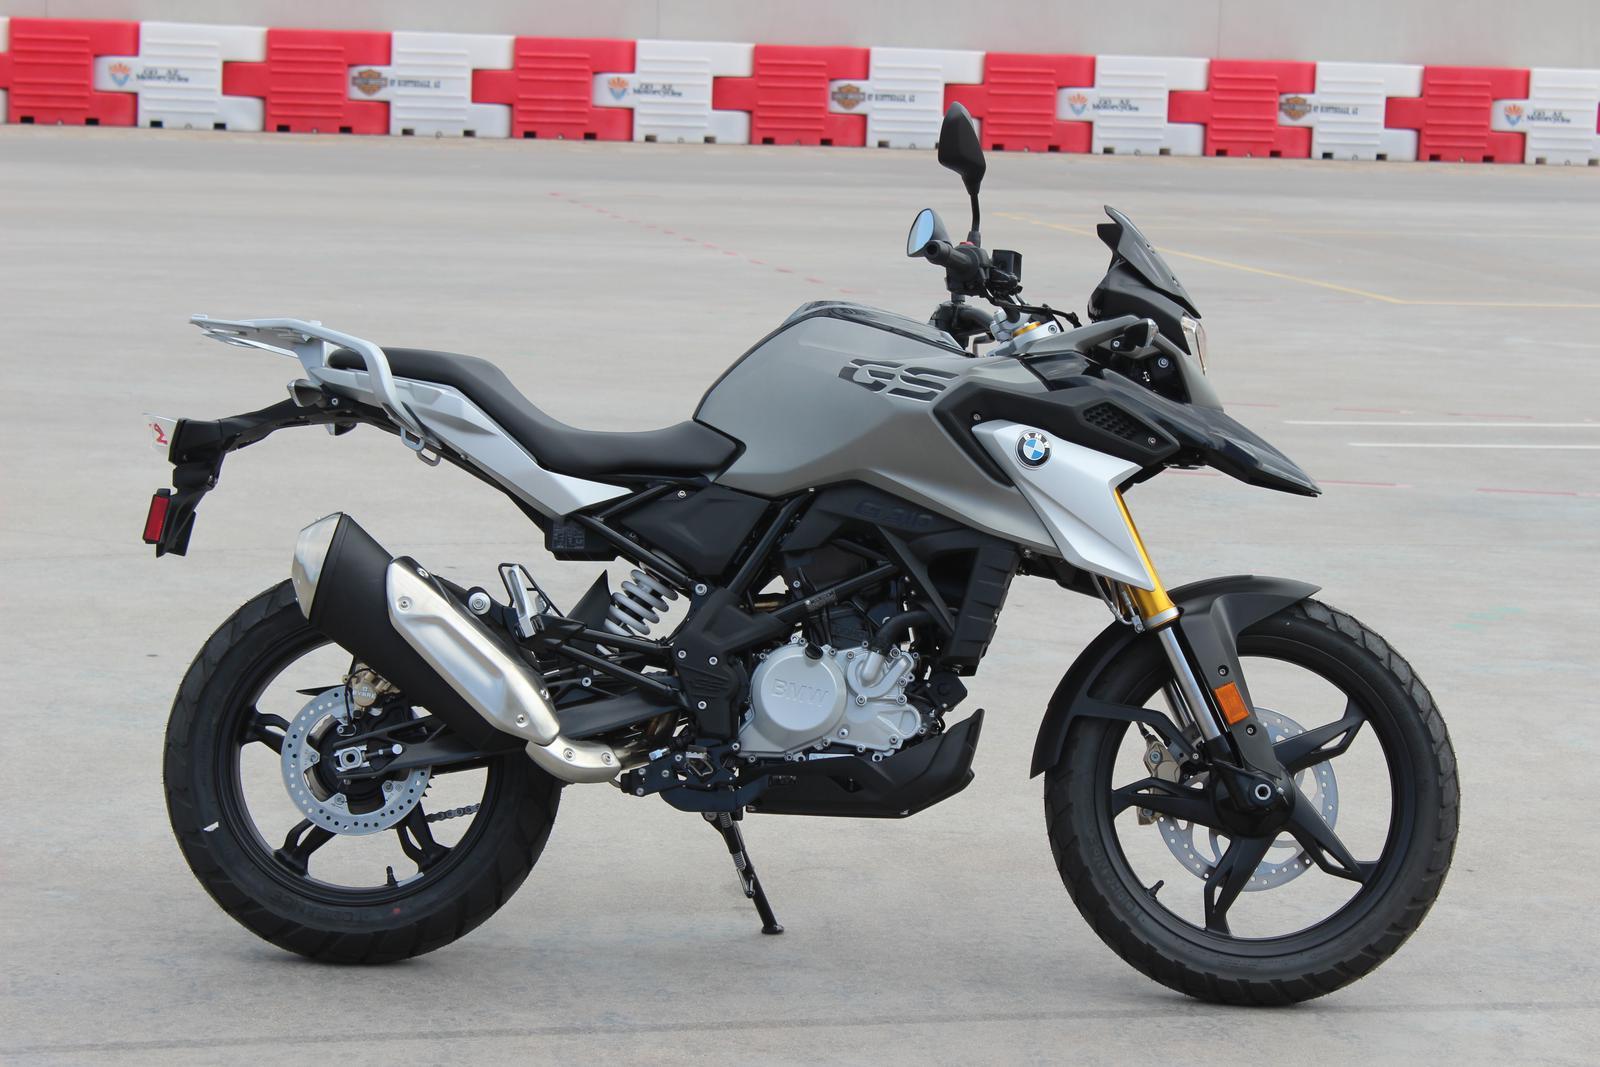 2018 BMW G 310 GS for sale in Scottsdale, AZ | GO AZ Motorcycles in ...